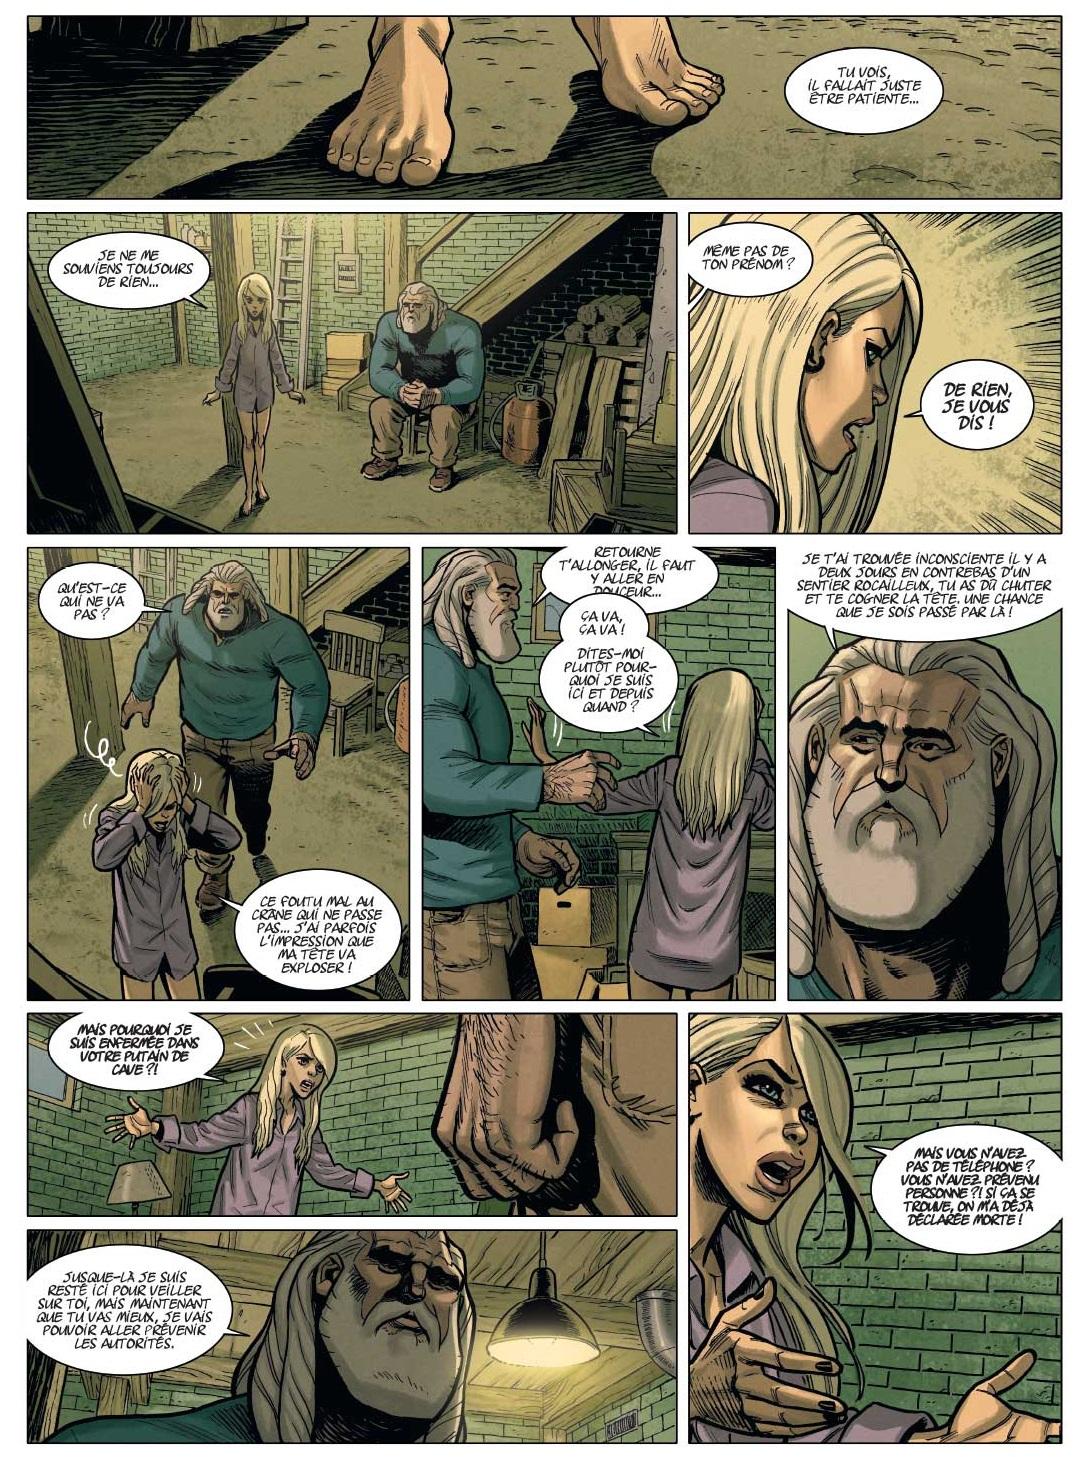 Harmony page 14